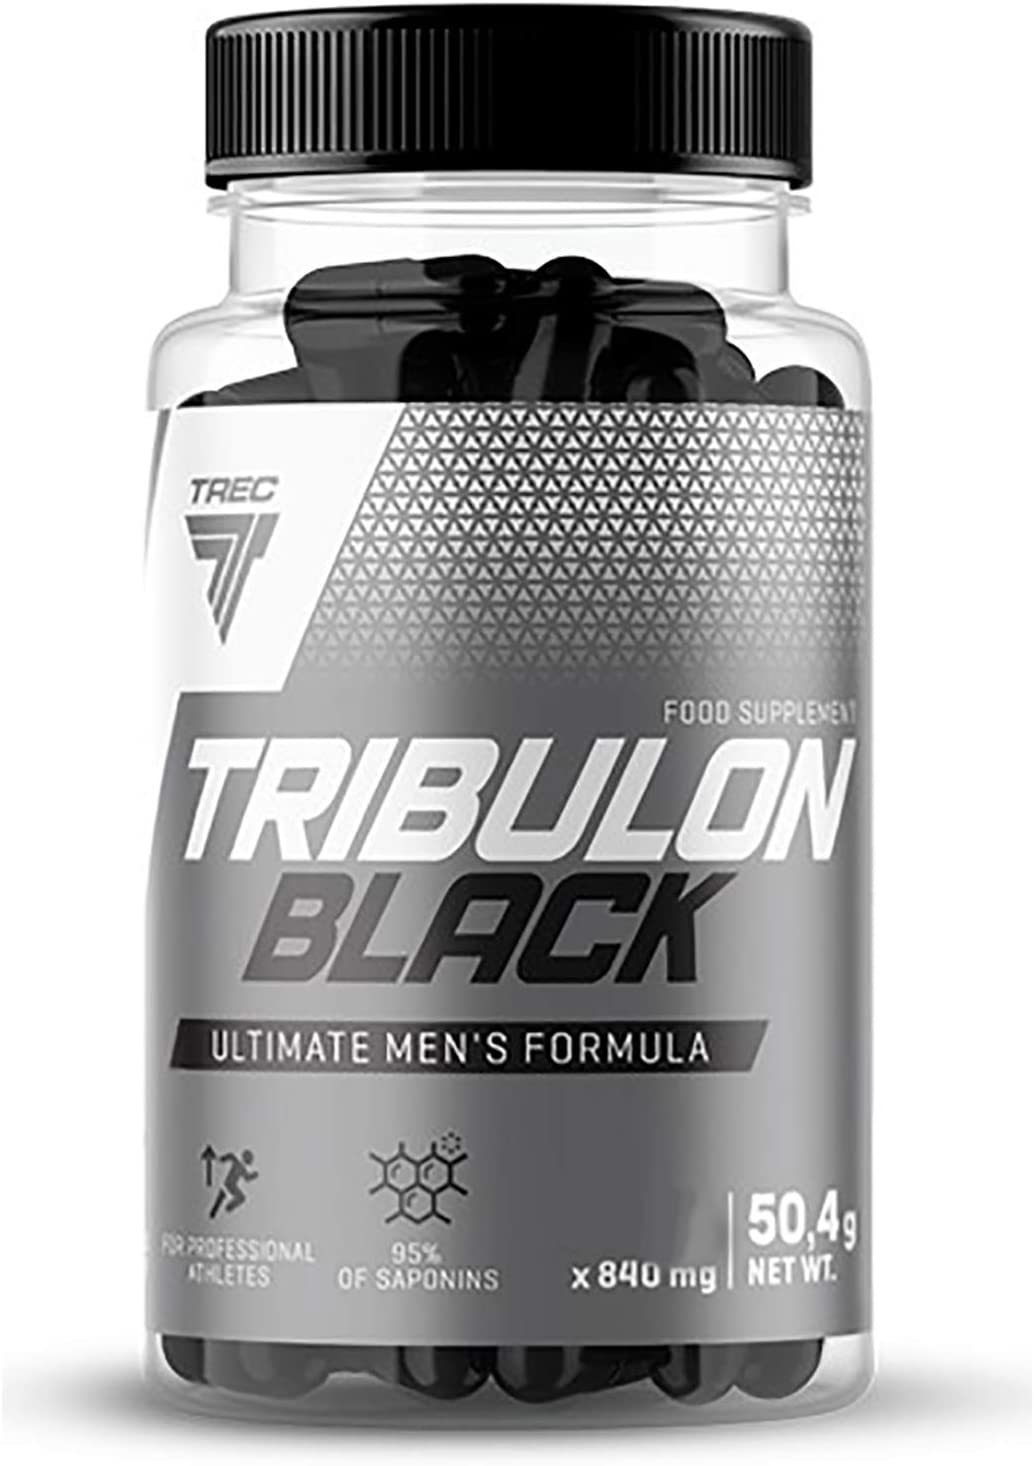 TRIBULON Black - Tribulon Negro - 95% de saponinas bioactivos - Extra Fuerte testosterona Estimulador - TREC Nutrition (60caps / 120caps)